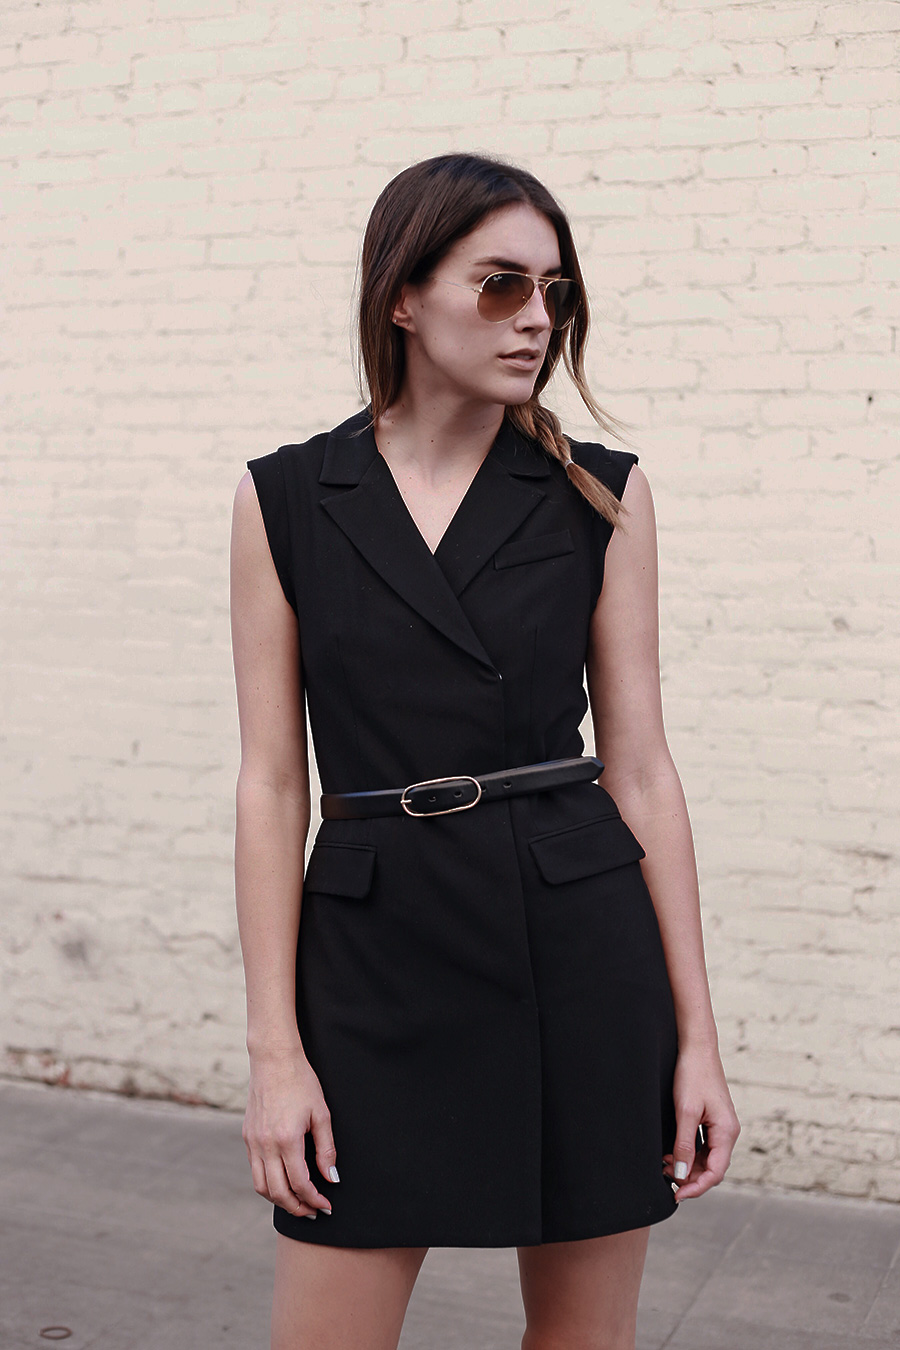 Ro & De Noir Black Dress, Vest, Belt, Leather Belt, Ray Bans, Aviators, Braids, Side Braid, brittanyxavier.com